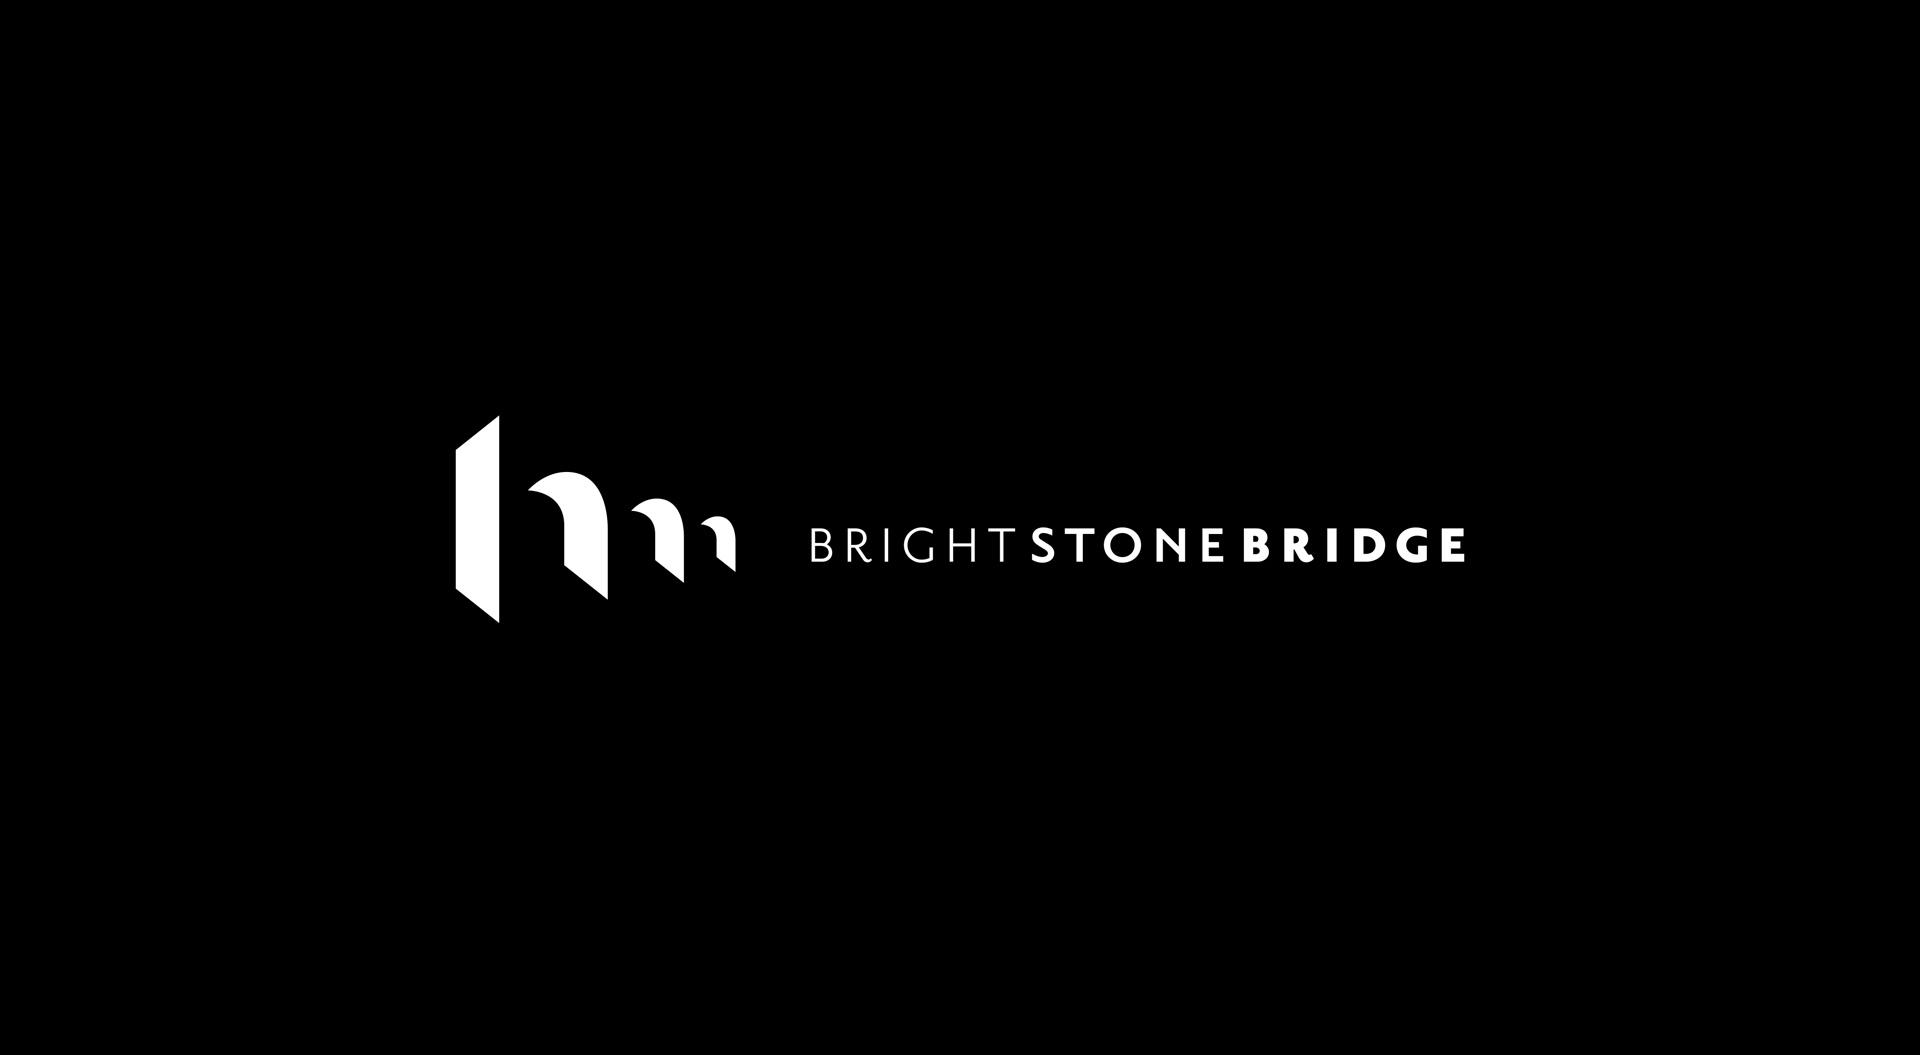 Brightstonebridge logo wide